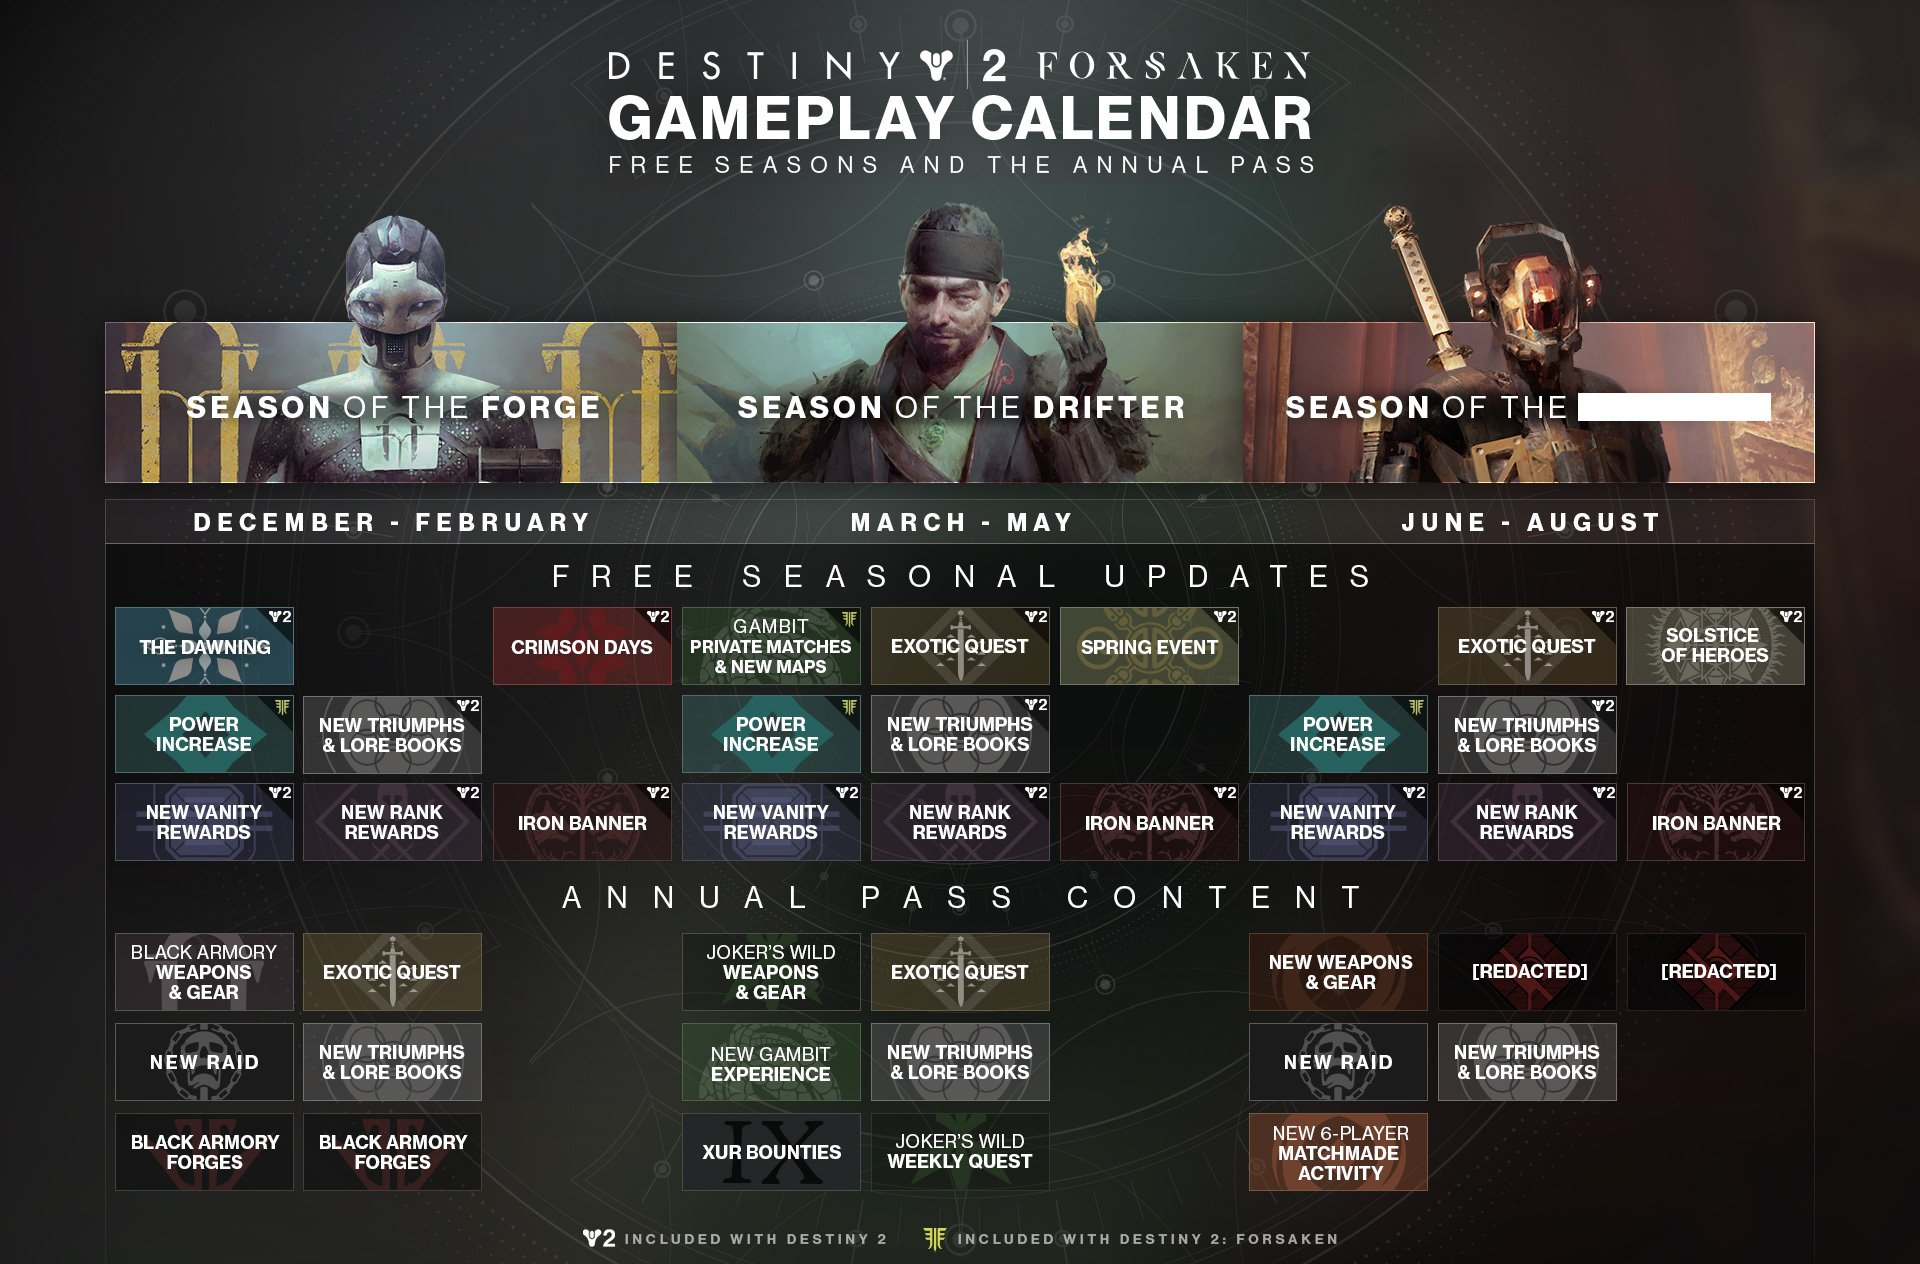 Destiny 2 Annual Pass roadmap